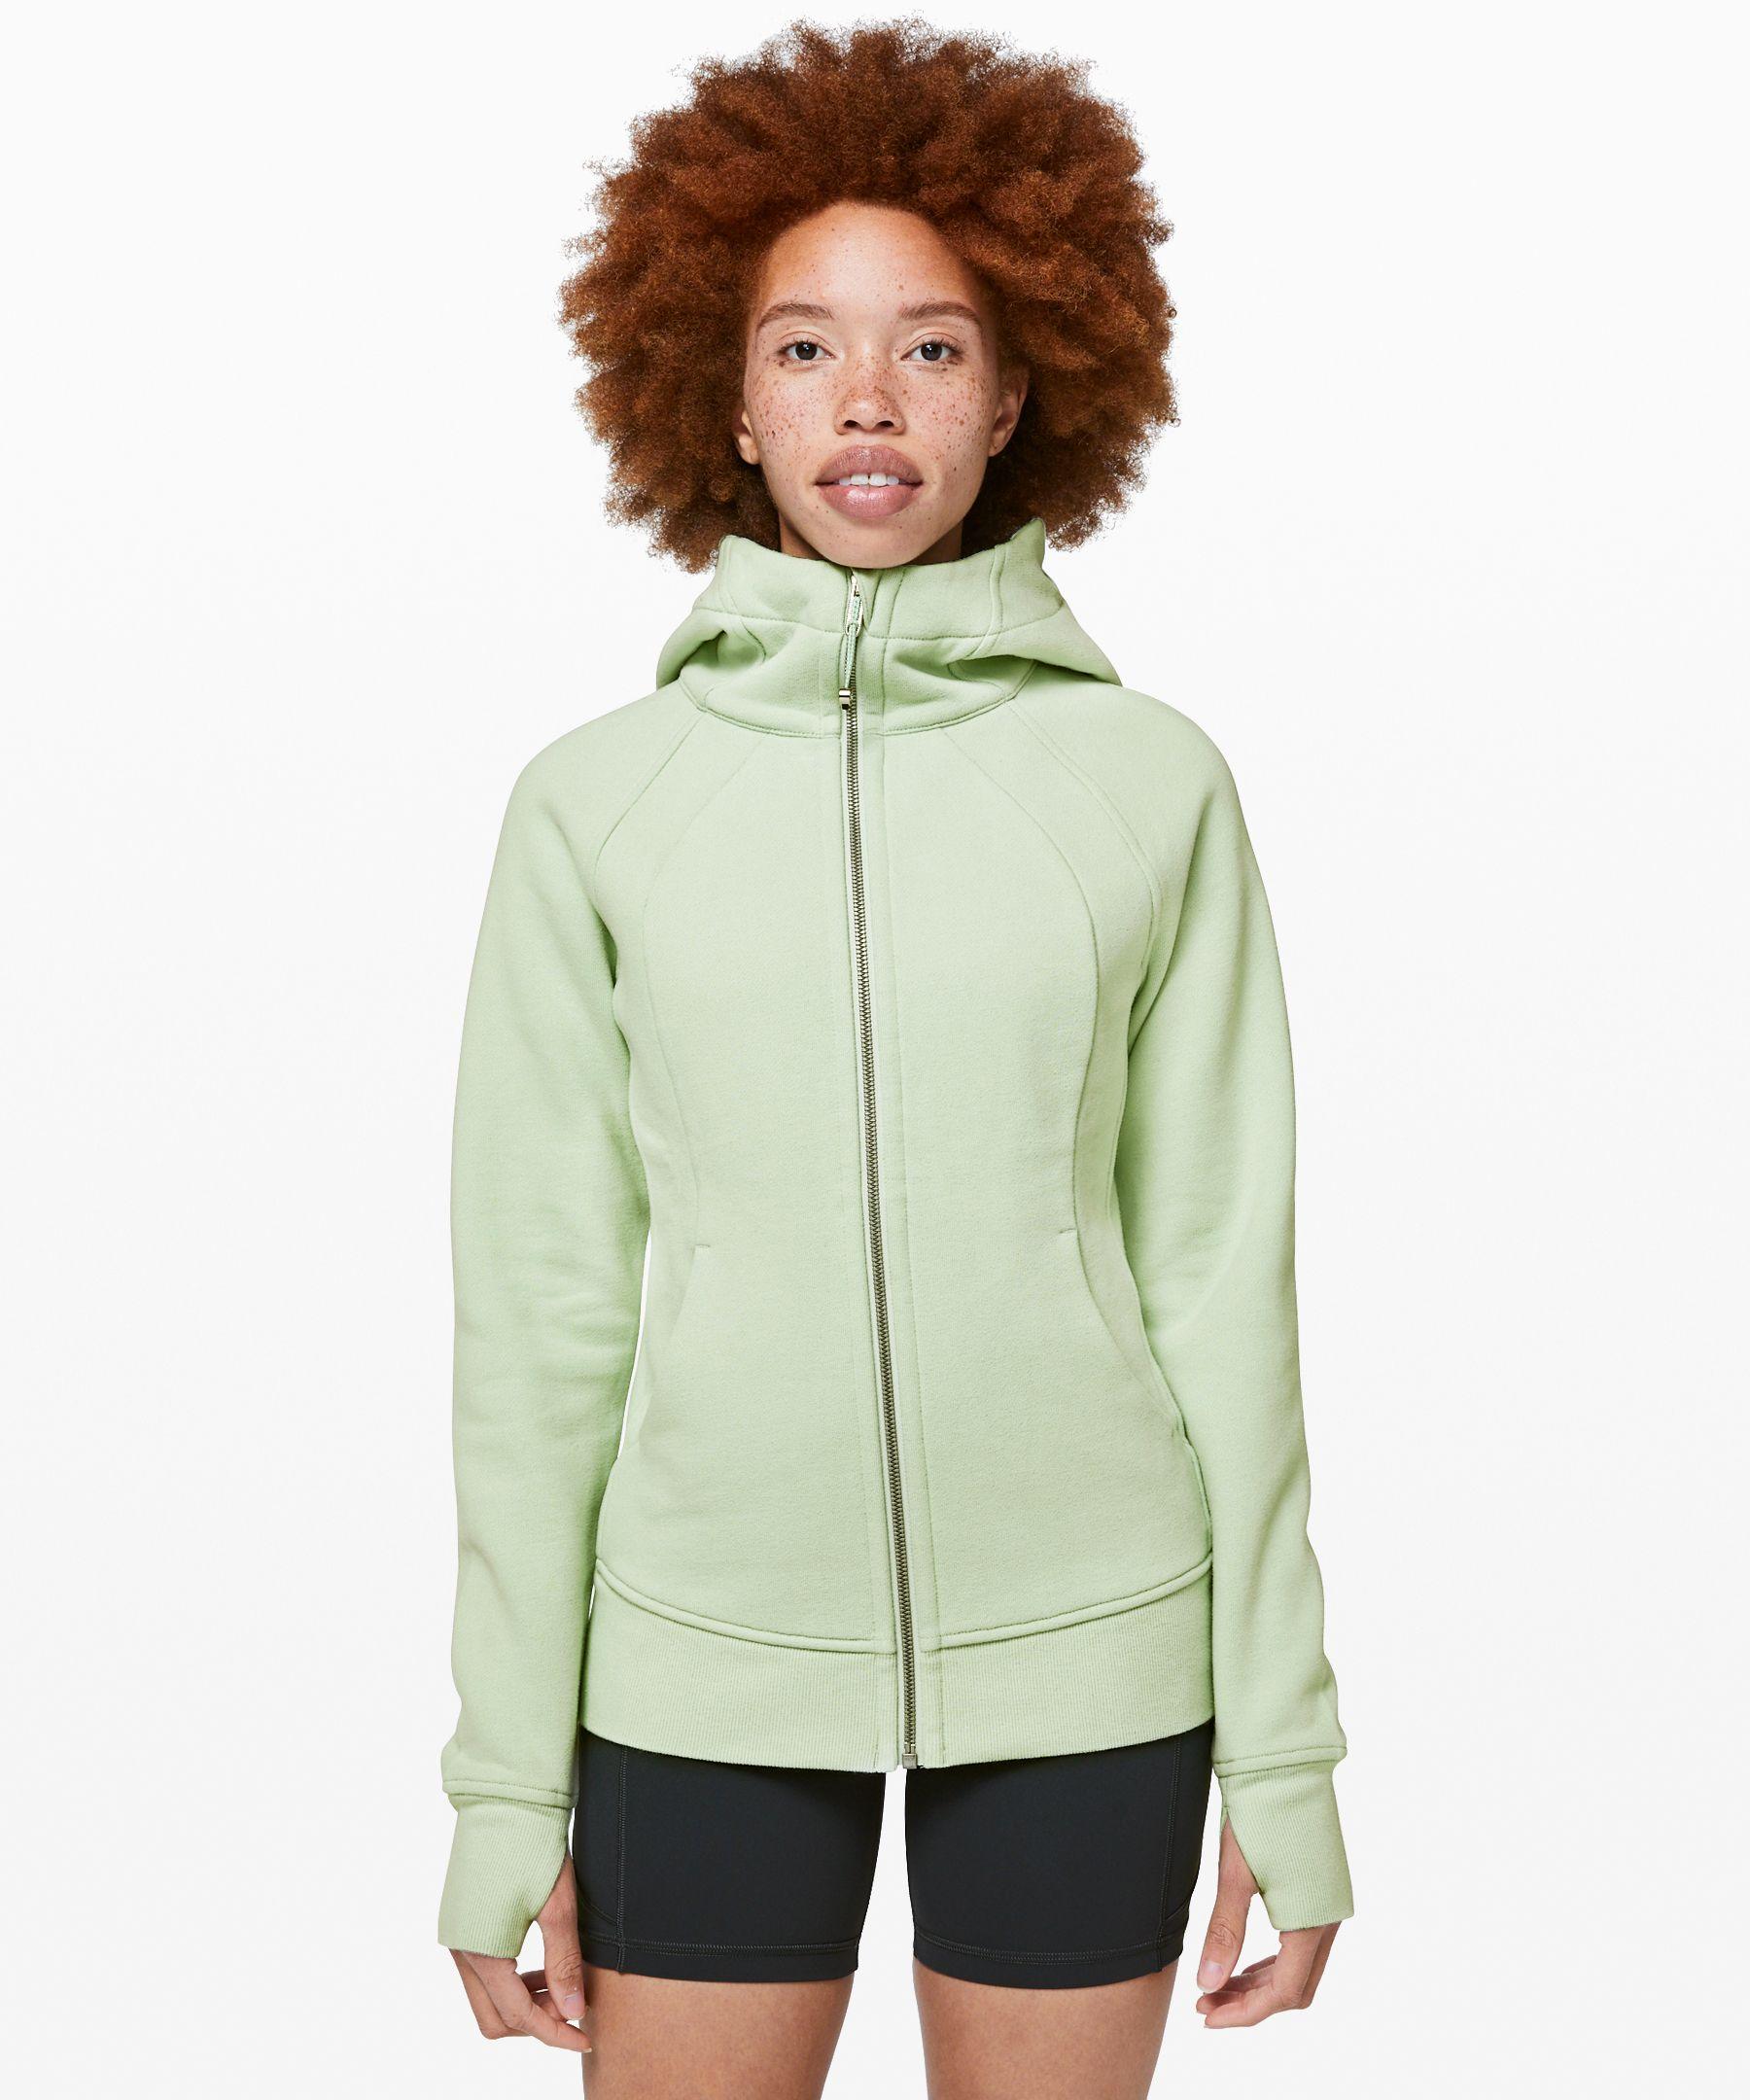 920d718214 Scuba Hoodie *Light Cotton Fleece   Women's Hoodies   lululemon athletica